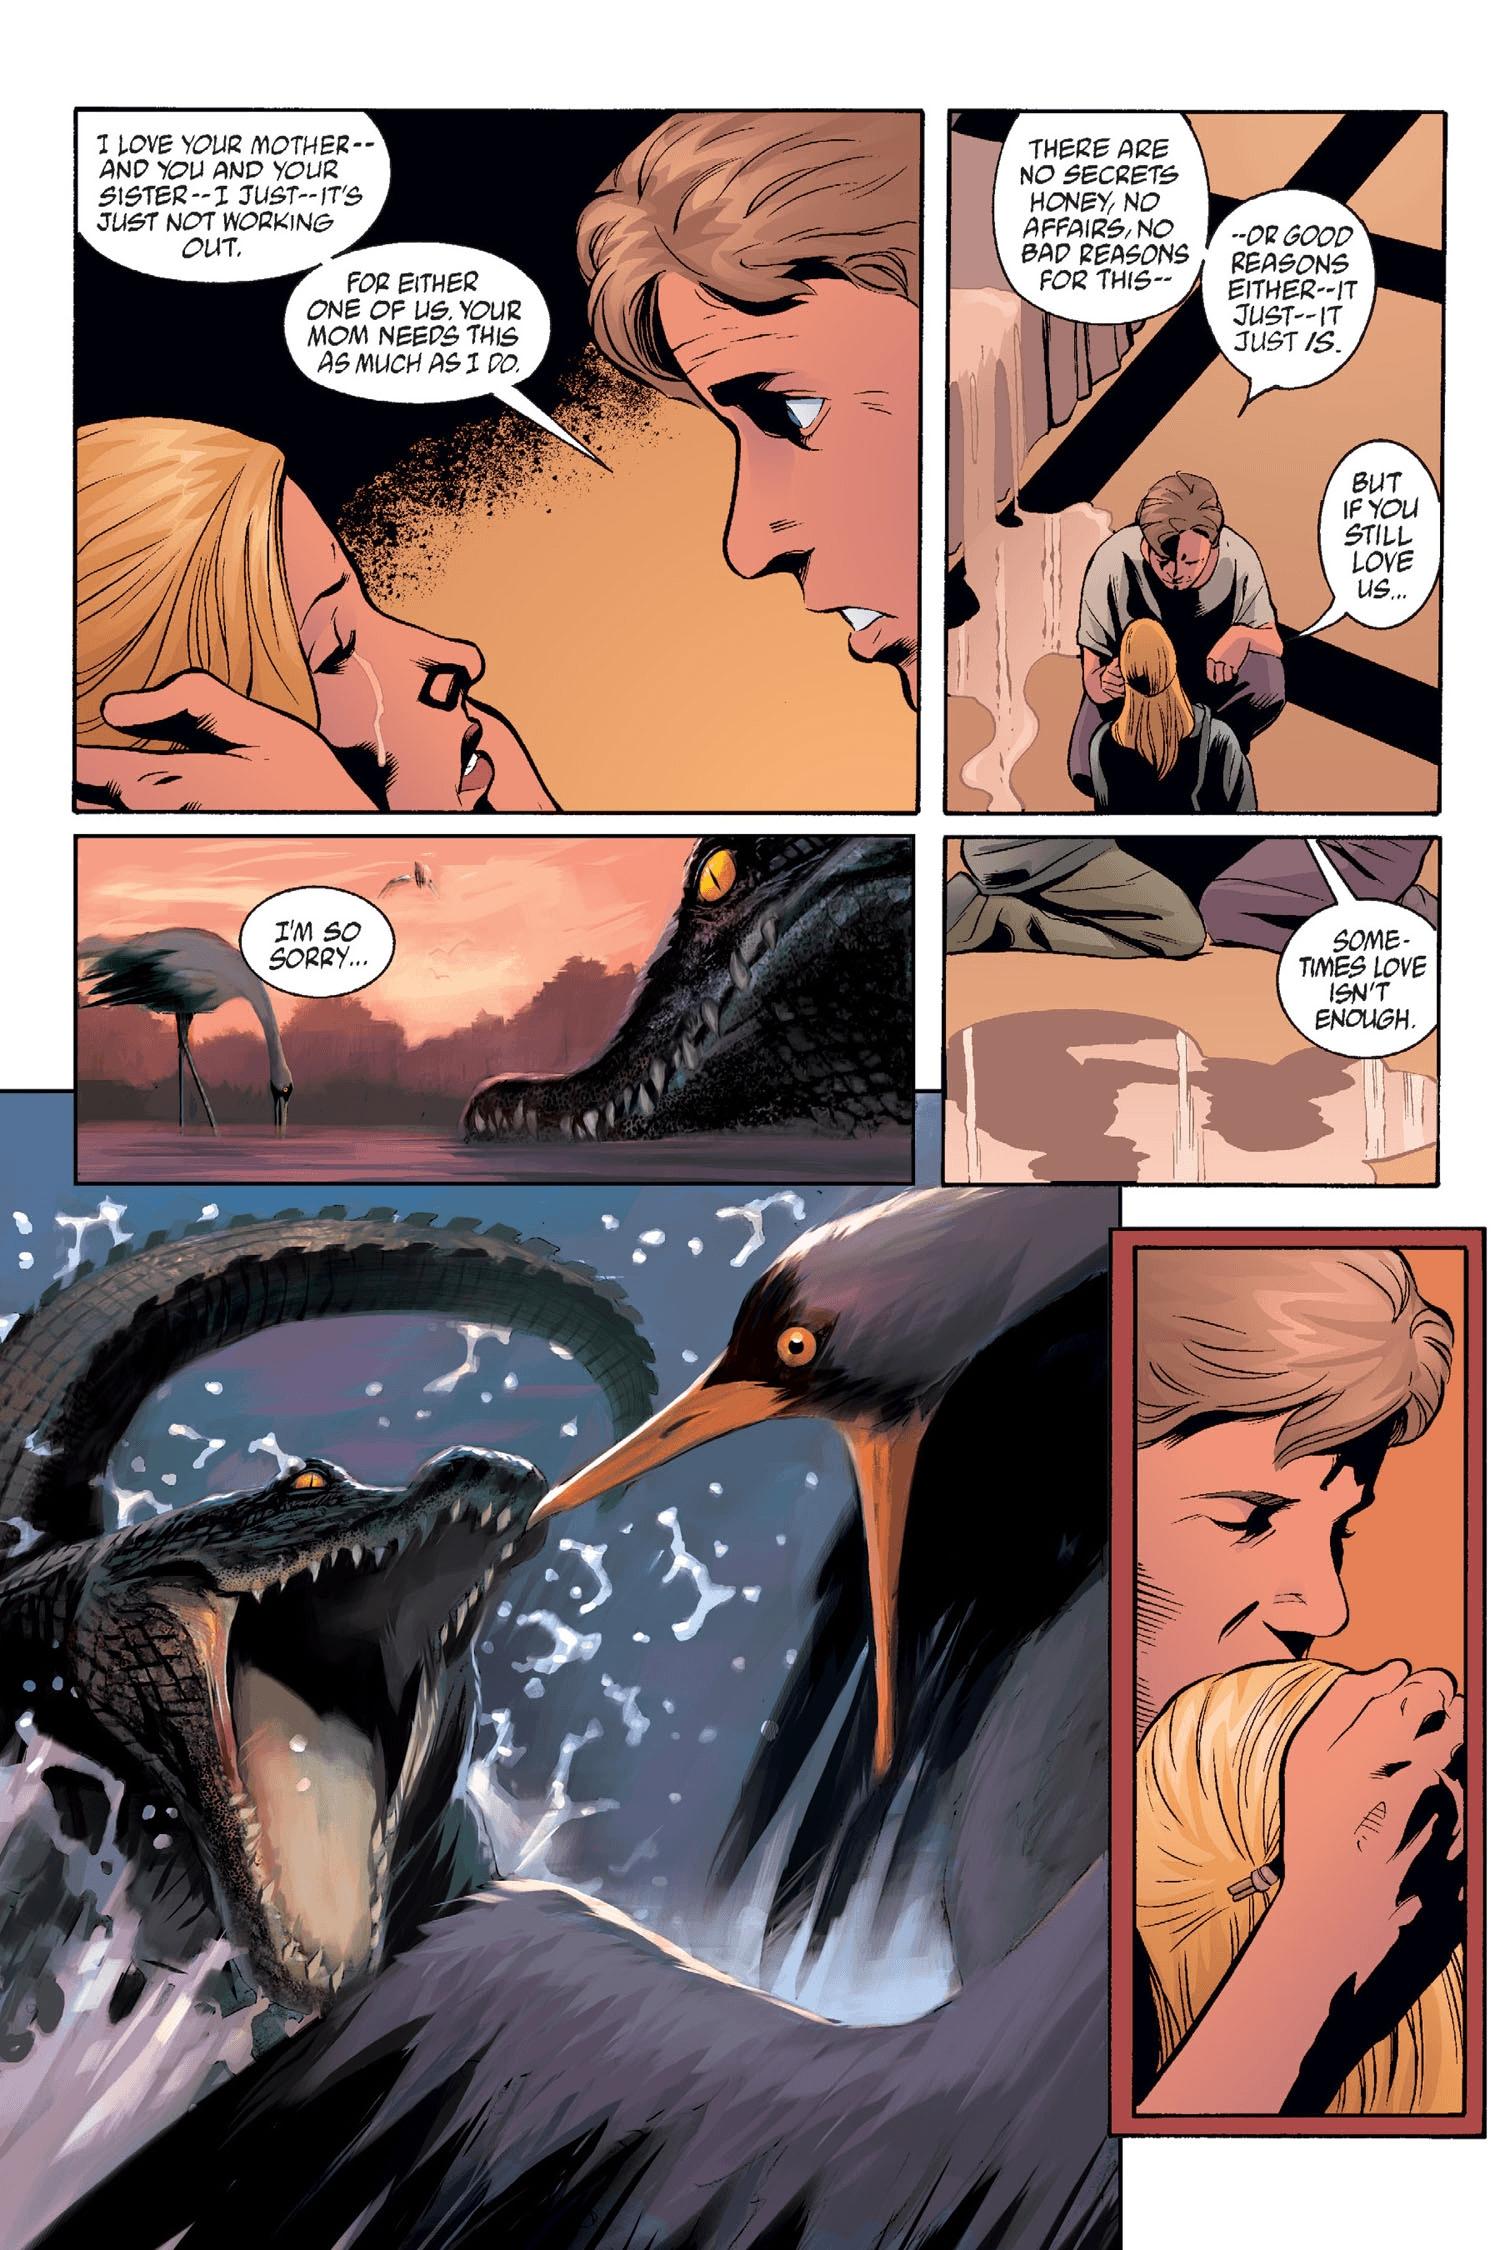 Read online Buffy the Vampire Slayer: Omnibus comic -  Issue # TPB 2 - 40